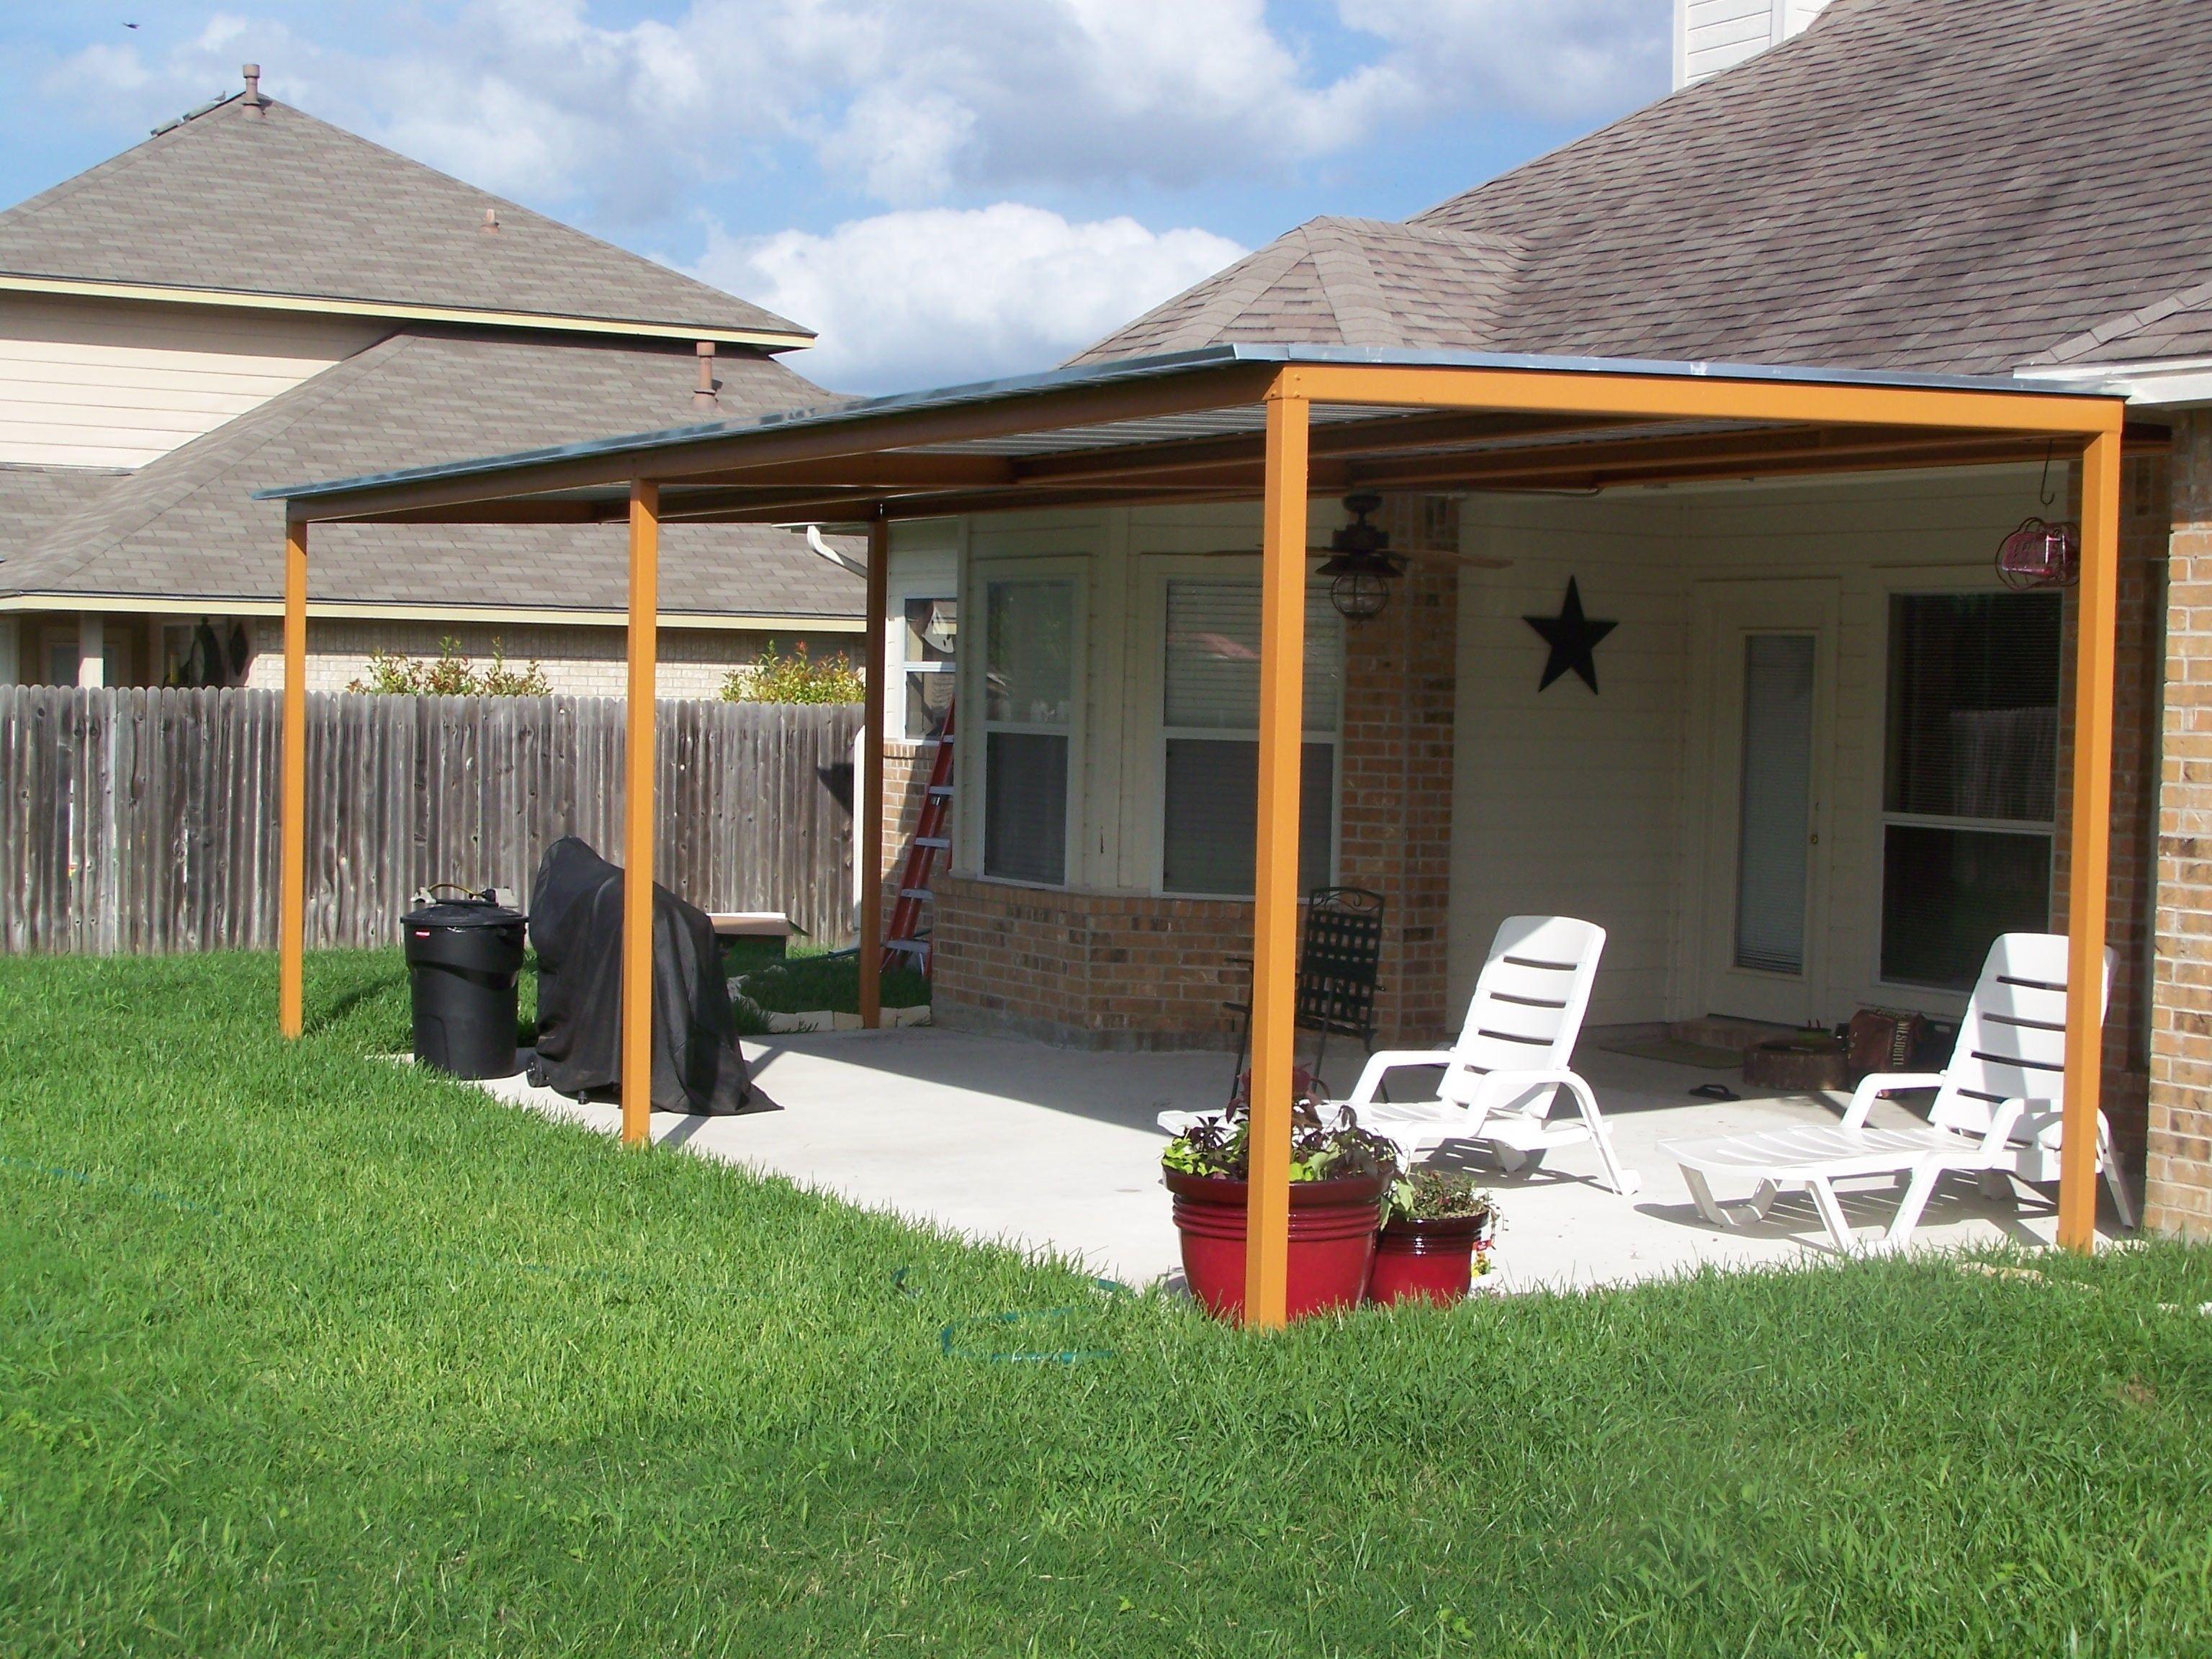 Outdoor Vinyl Porch Blinds Porch Sun Blockers Portable Patio Shade Throughout Inspirational Back Porch Awning Ideas Si06js Pergola Inexpensive Patio Shade Ideas Patio Shade